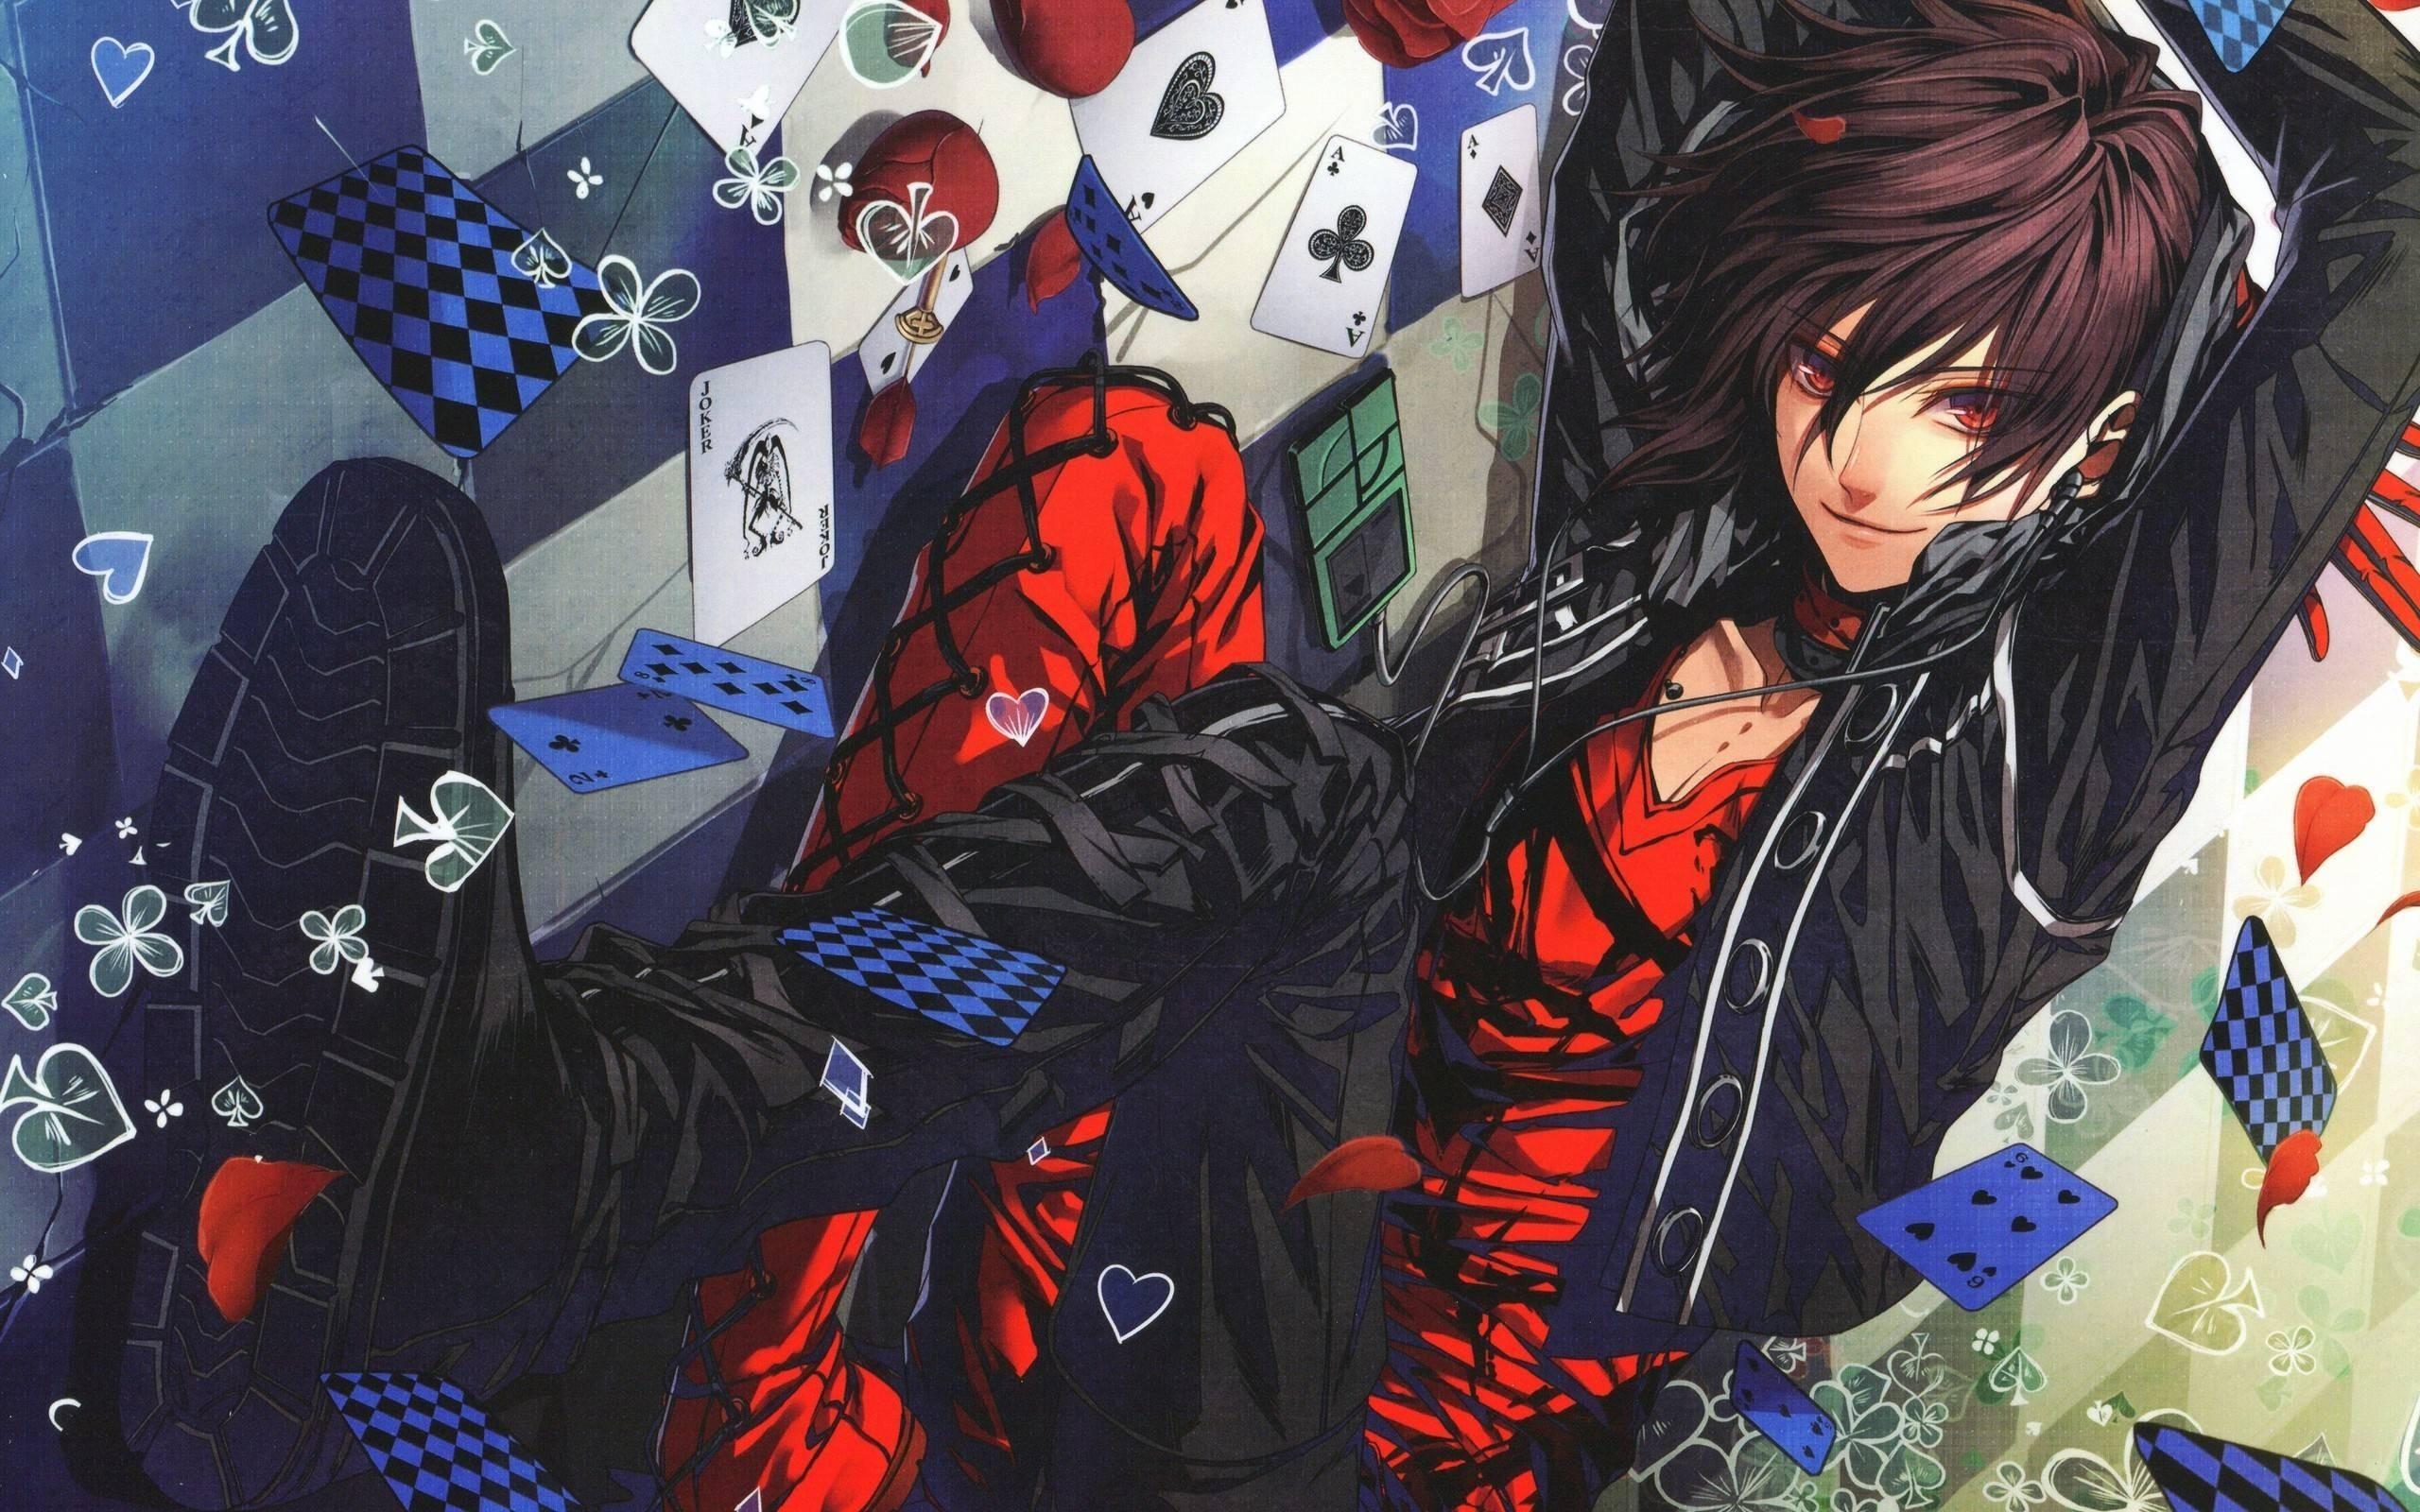 Anime Boy Wallpaper Hd 68 Images